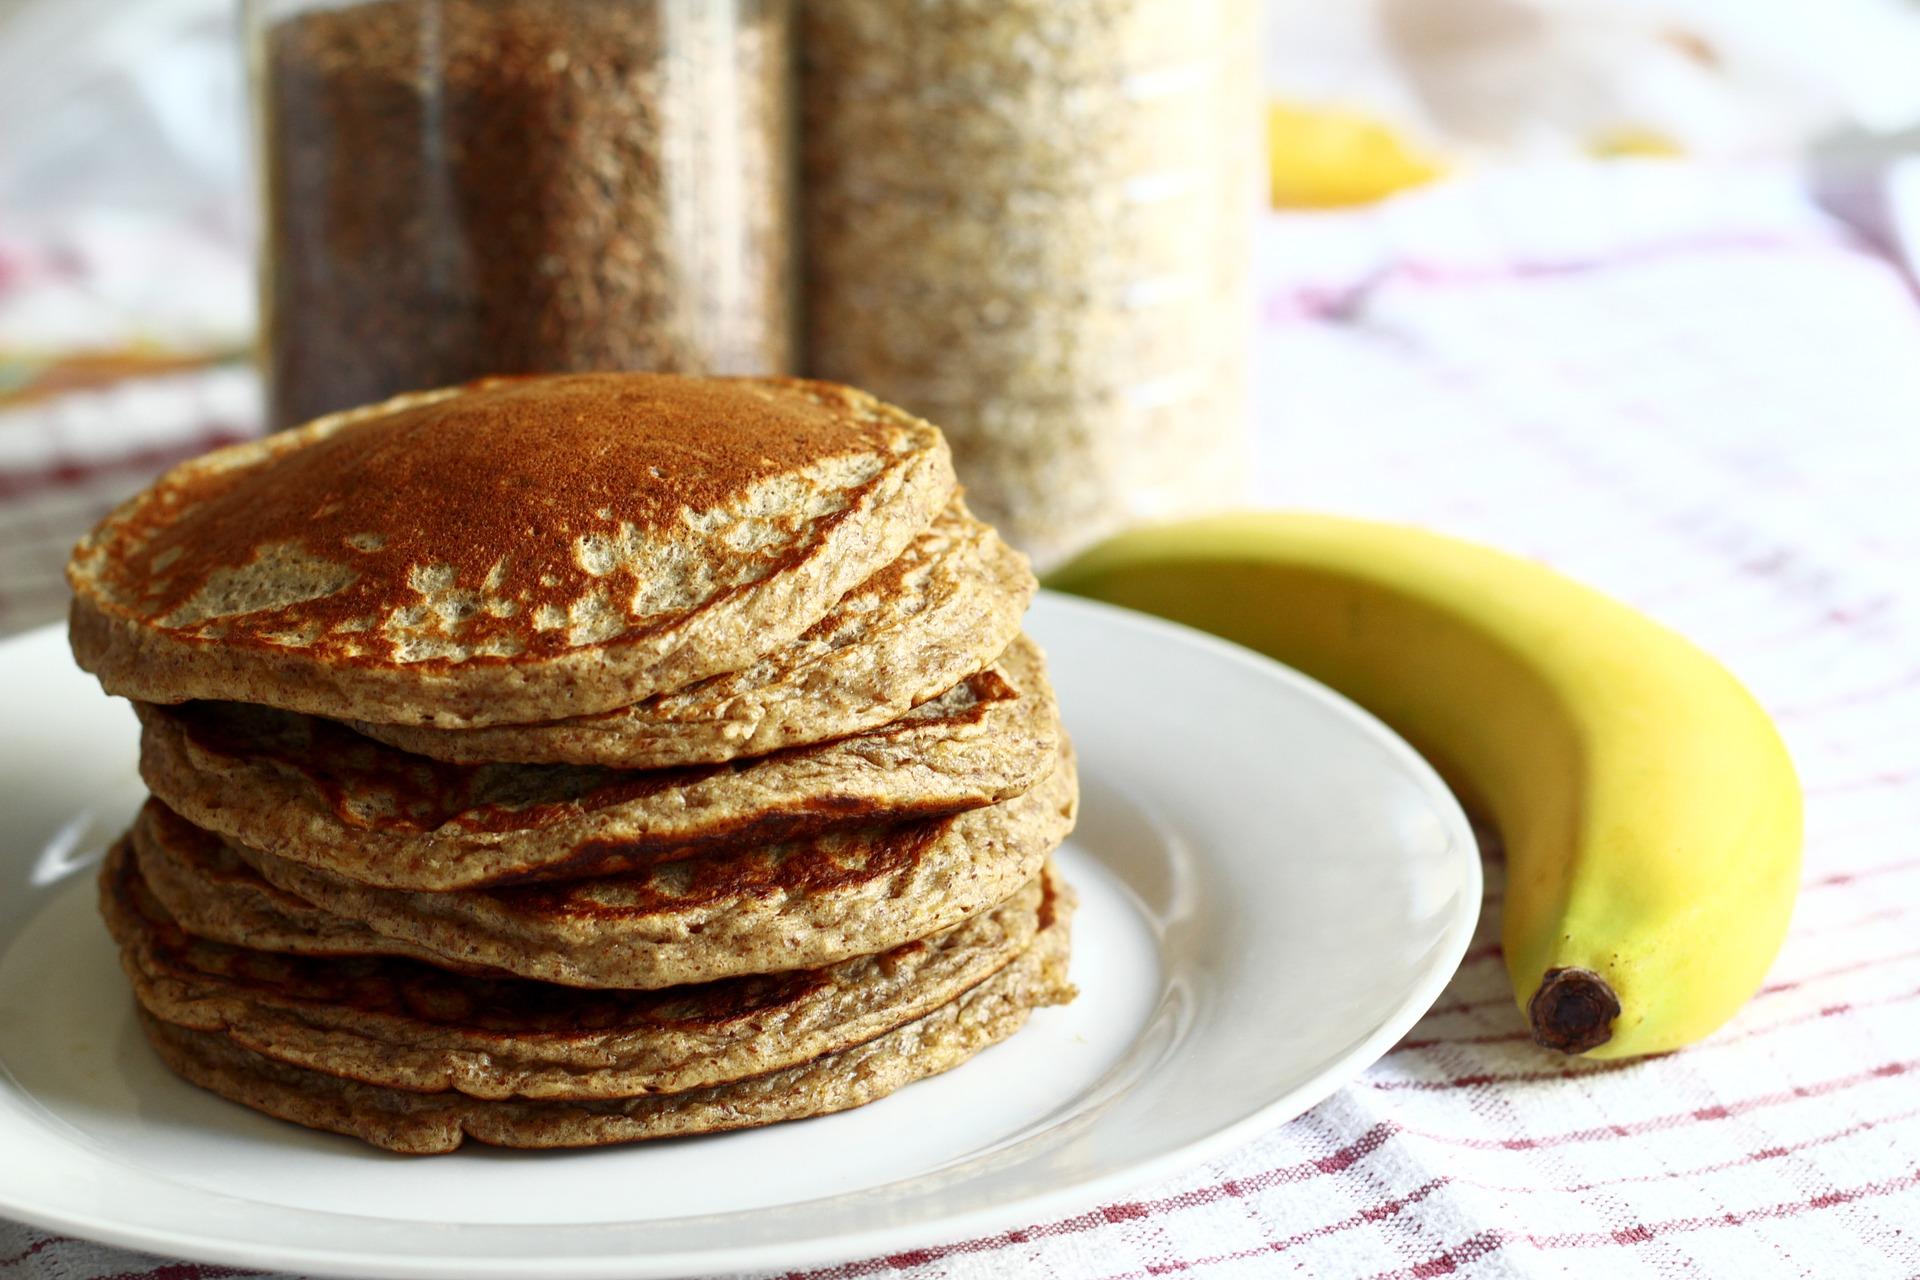 Диетический завтрак за5 минут: банановые оладьи без сахара имуки